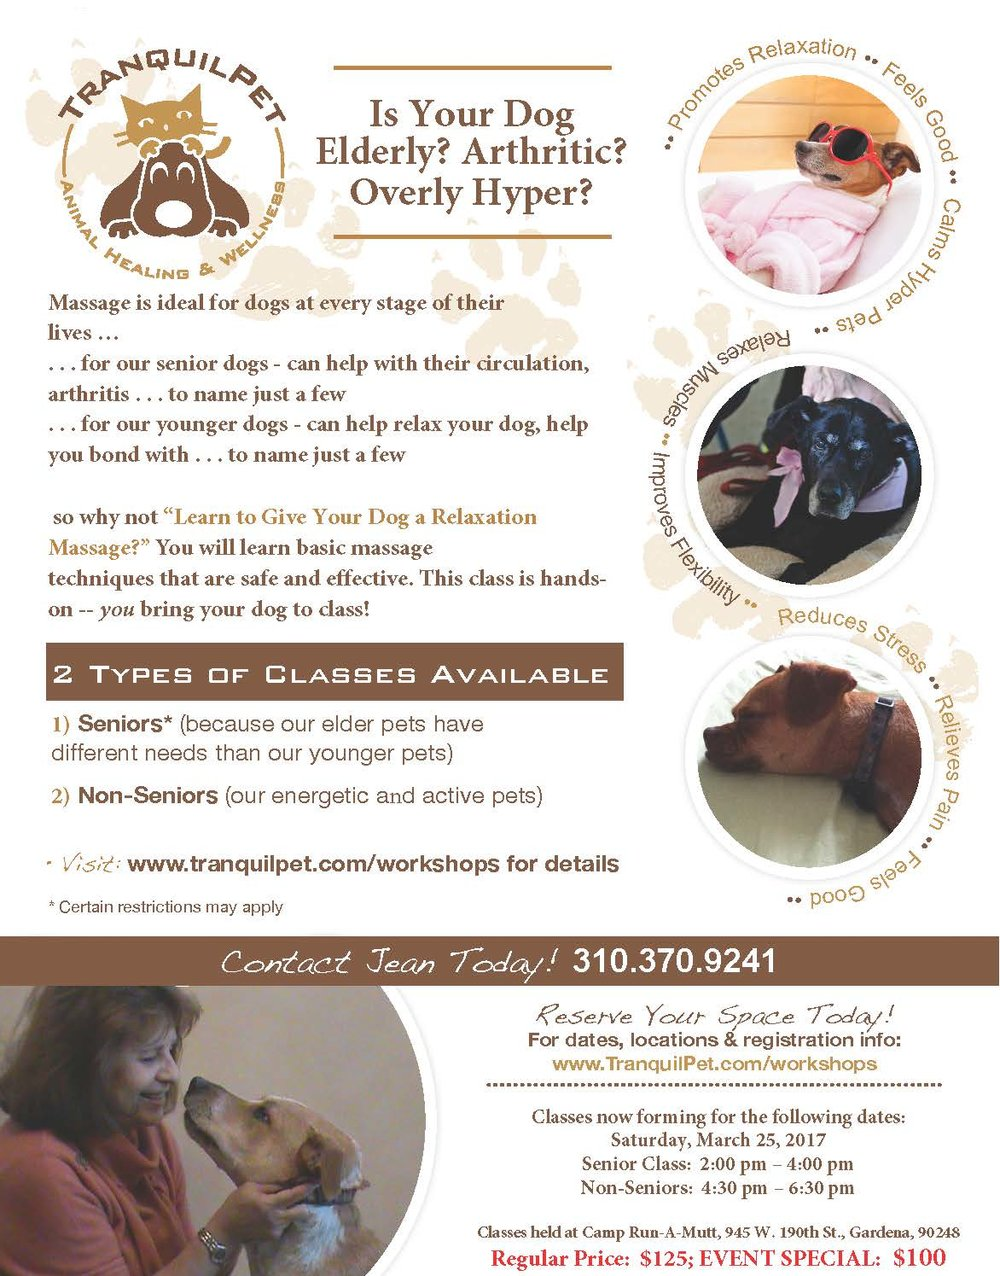 animal massage, dog massage, massage, dog swimming, Reiki for animals, animal Reiki